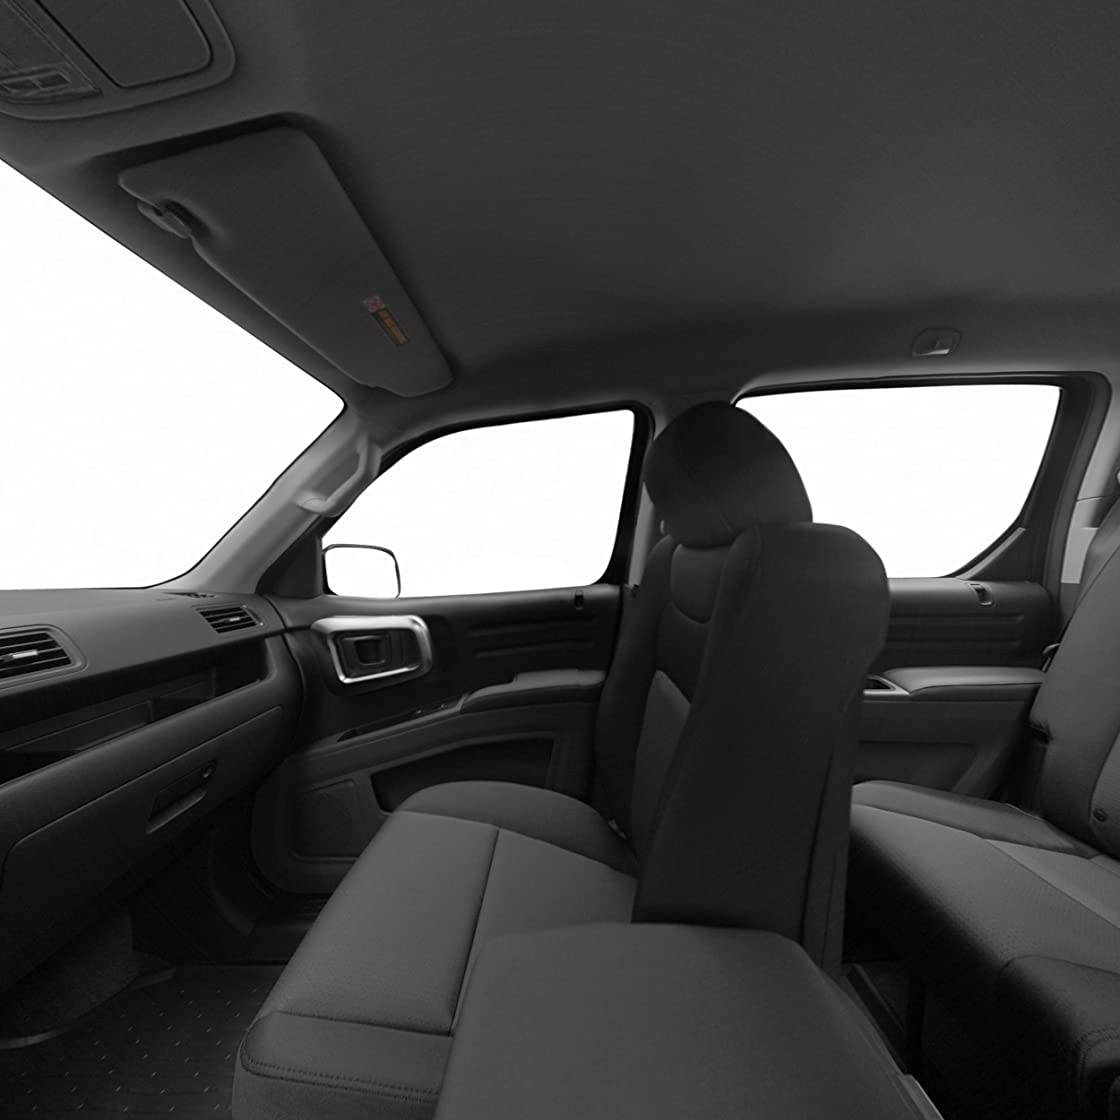 2007 Honda Ridgeline Reviews Images And Specs Vehicles Body Wiring Diagram For 1942 47 Chevrolet Passenger Cars Two Four Door Sedans